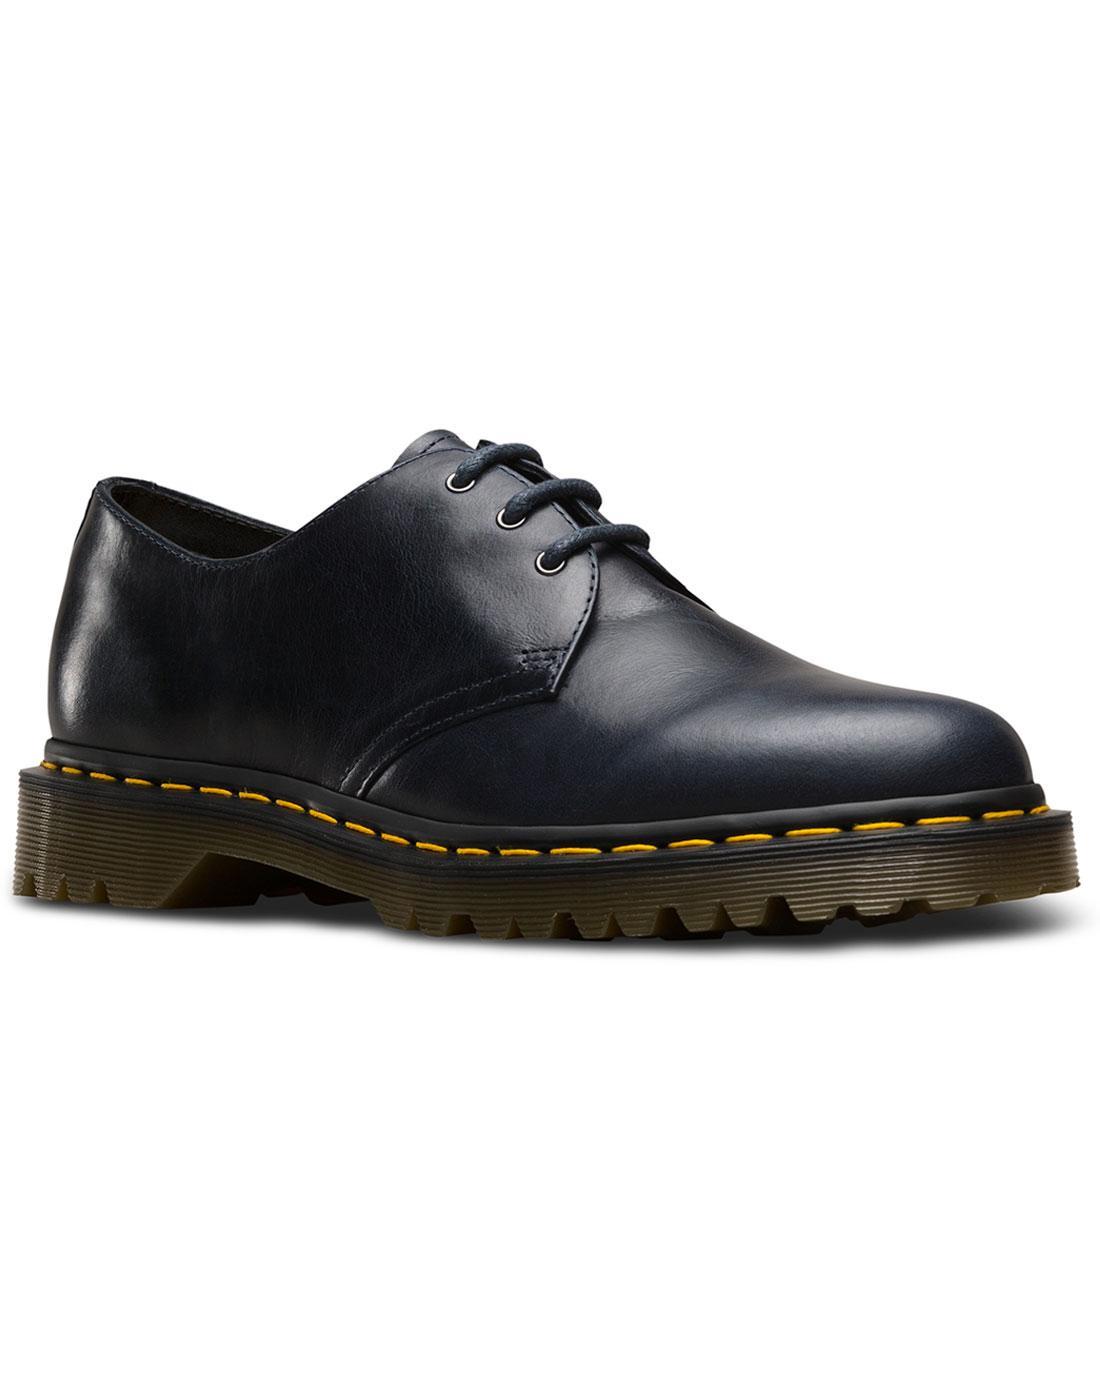 1461 Orleans DR MARTENS Retro Mod Derby Shoes NAVY